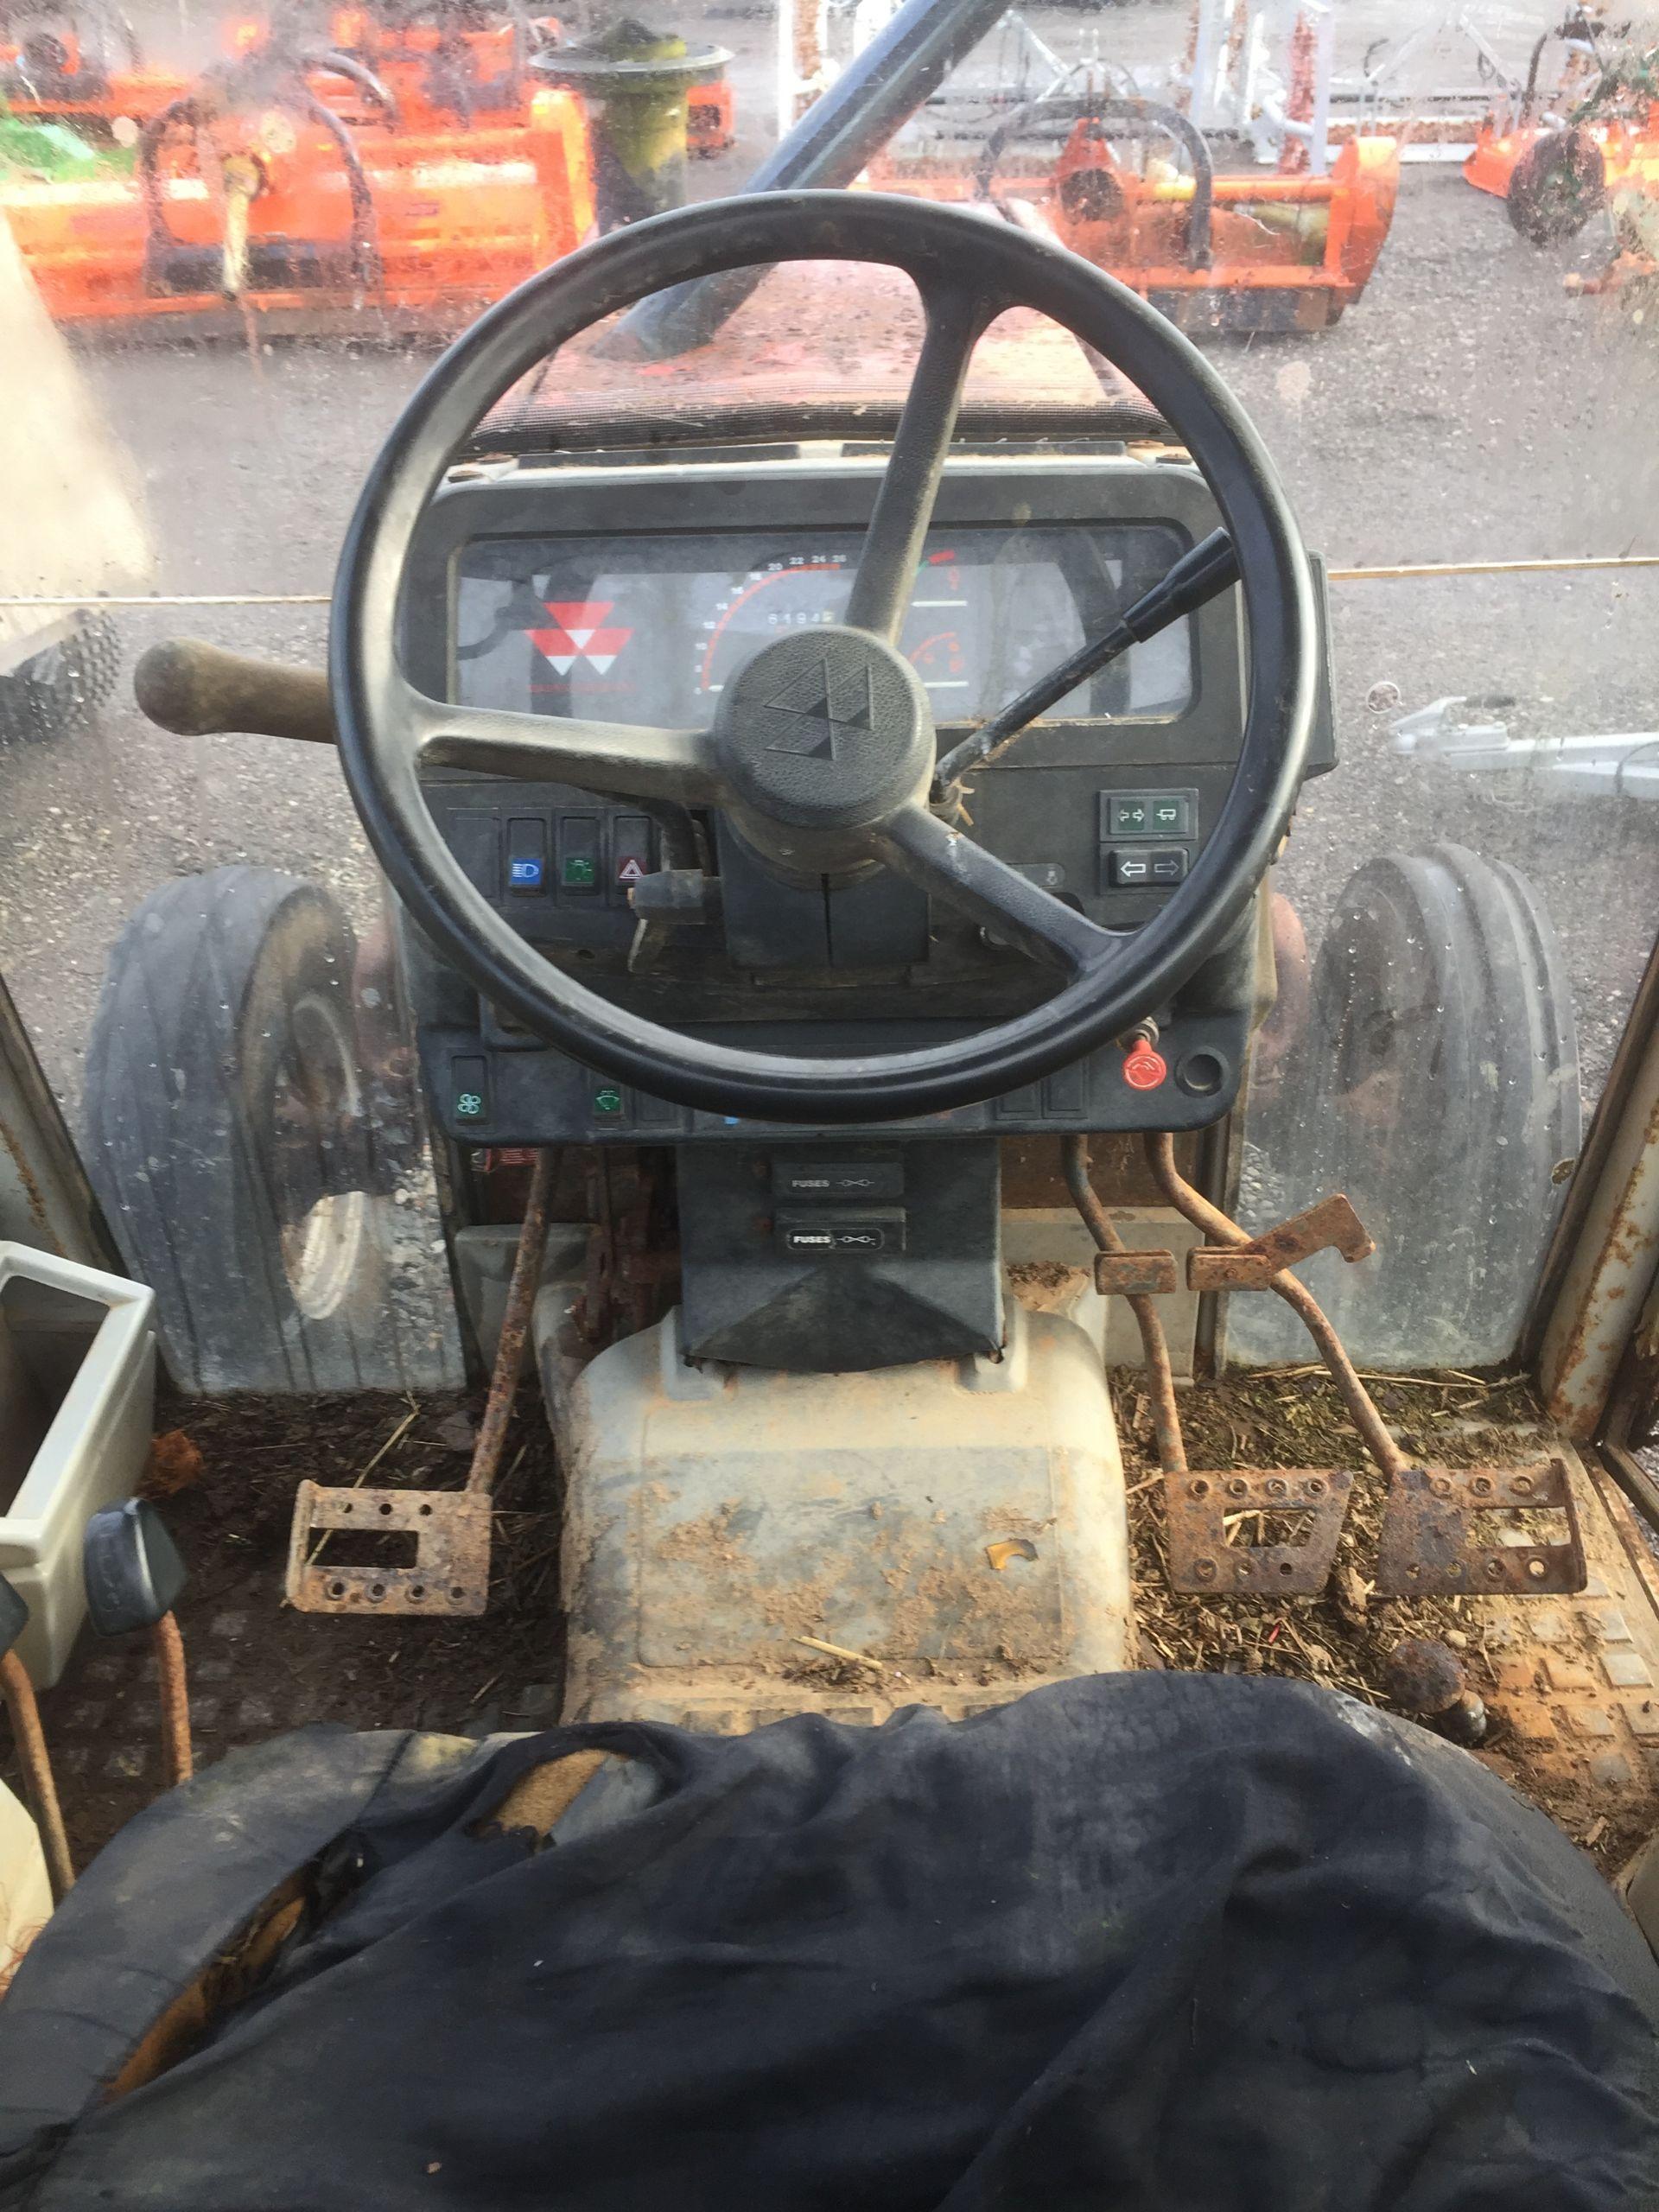 Lot 8 - Massey Ferguson 390 2wd 12x12 tractor, Registration No. K653 SDE, Hours: N/A